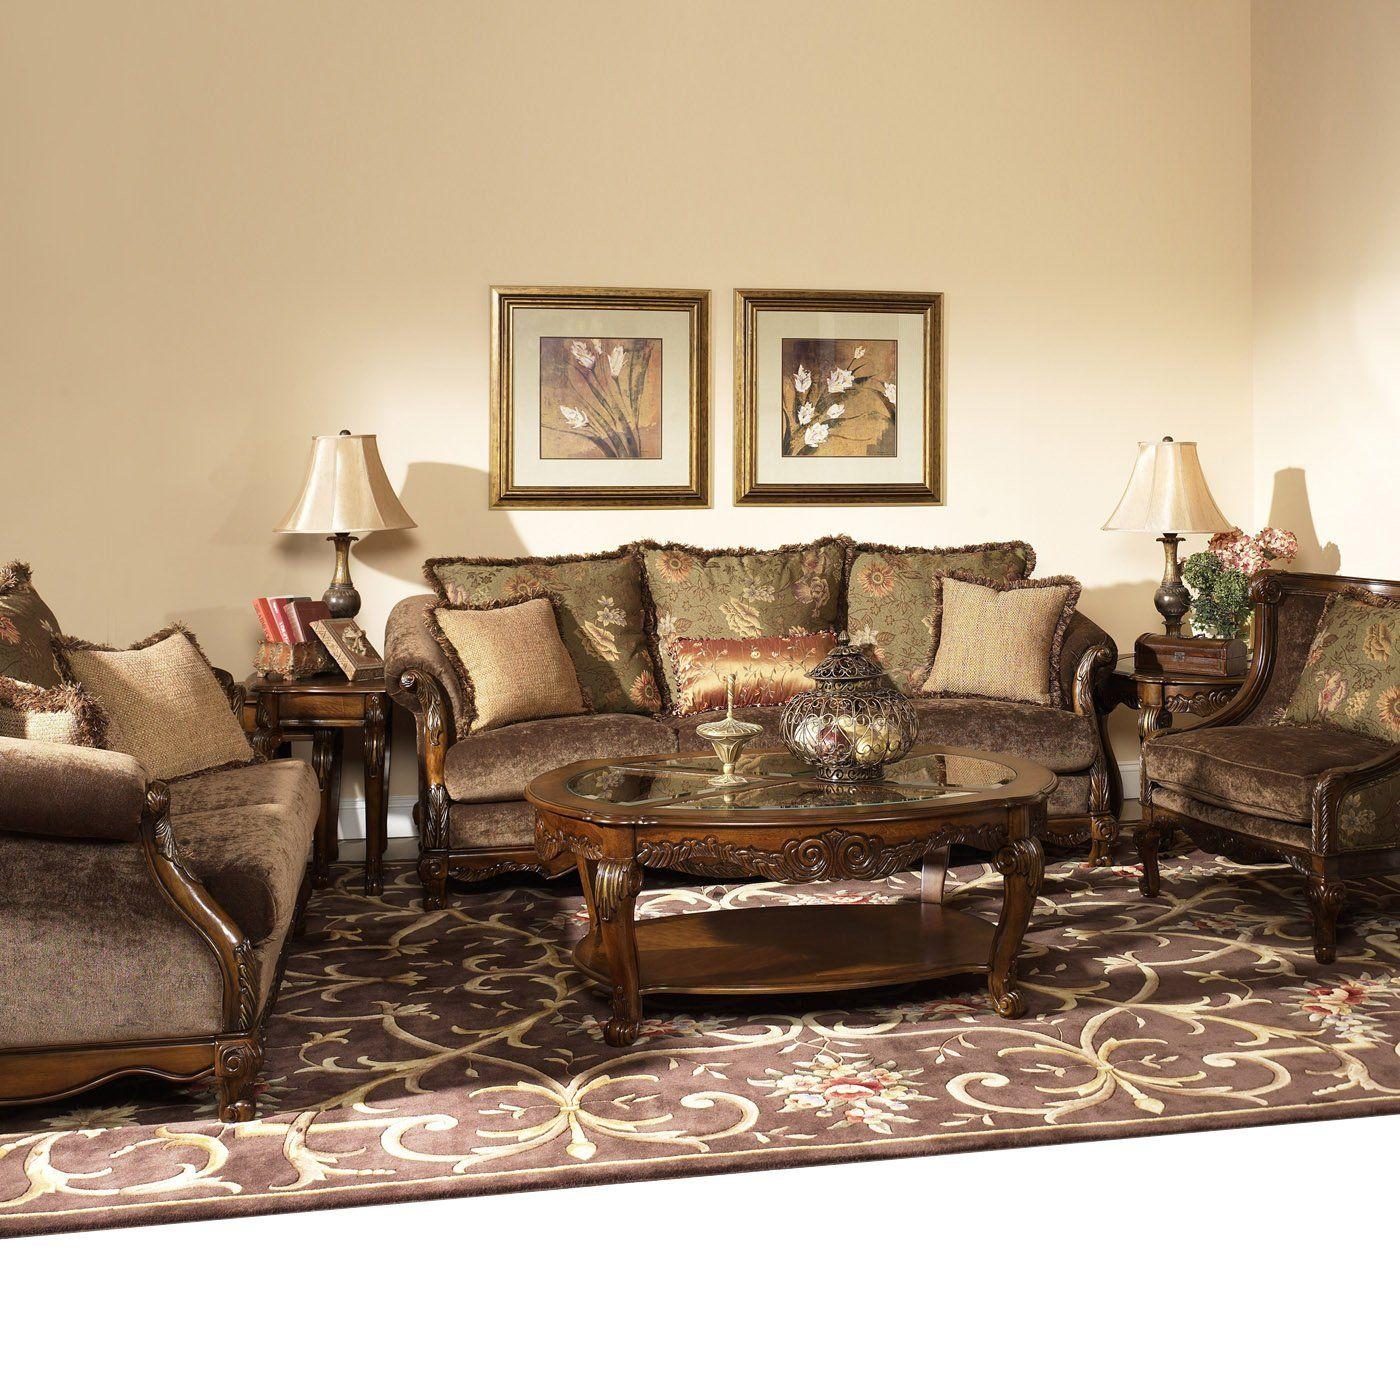 Home Decor Sofa Set: Fairmont Designs Furniture Repertoire